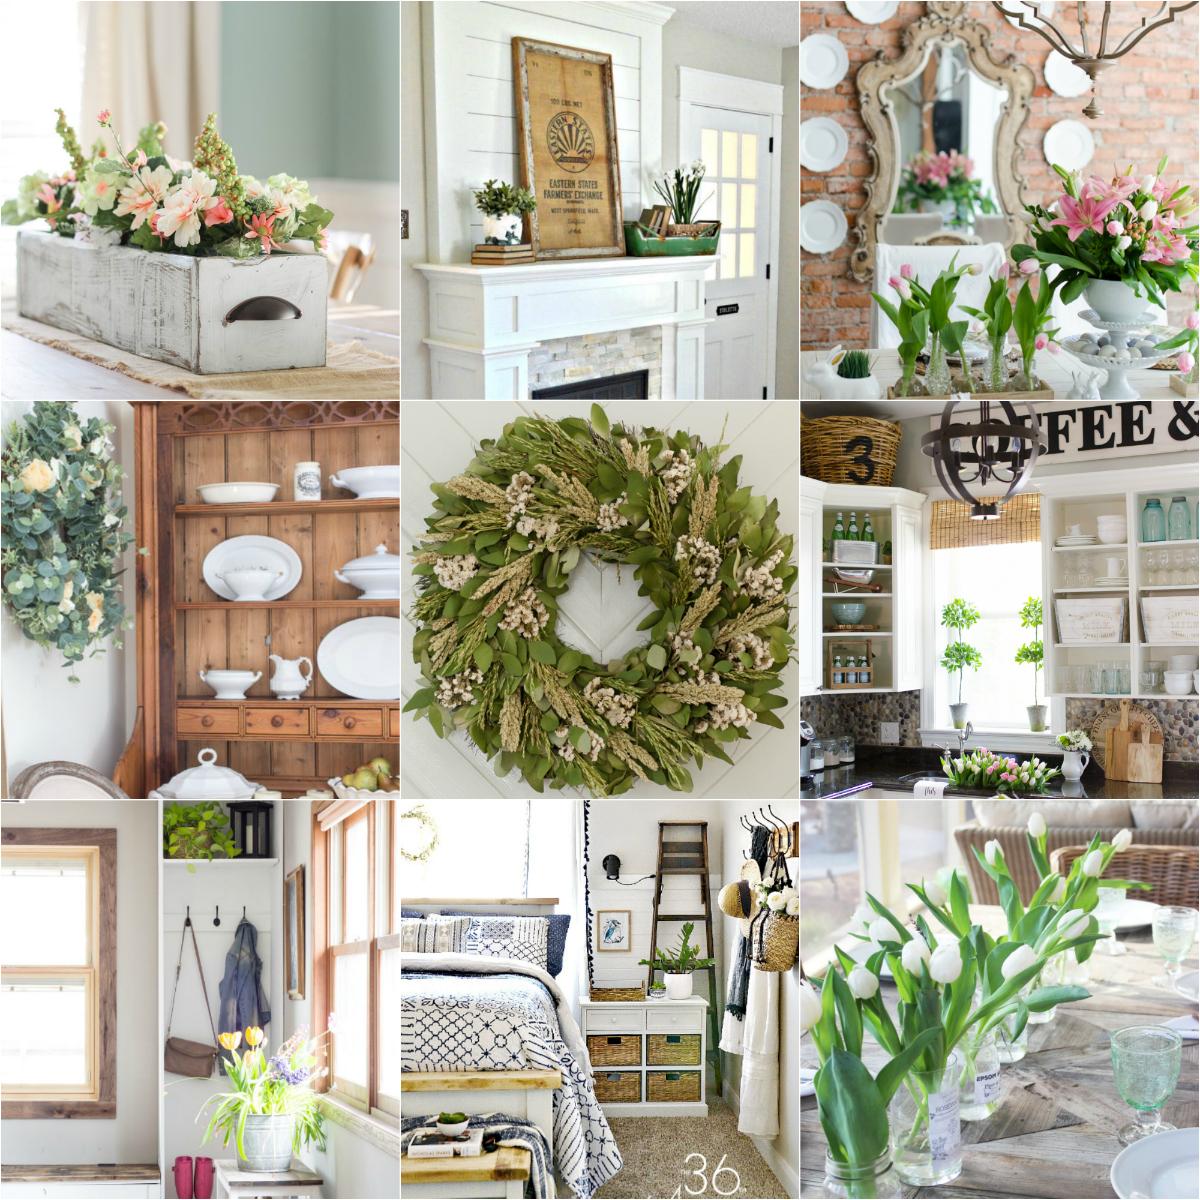 18 Spring Decor Ideas  Home Stories A to Z